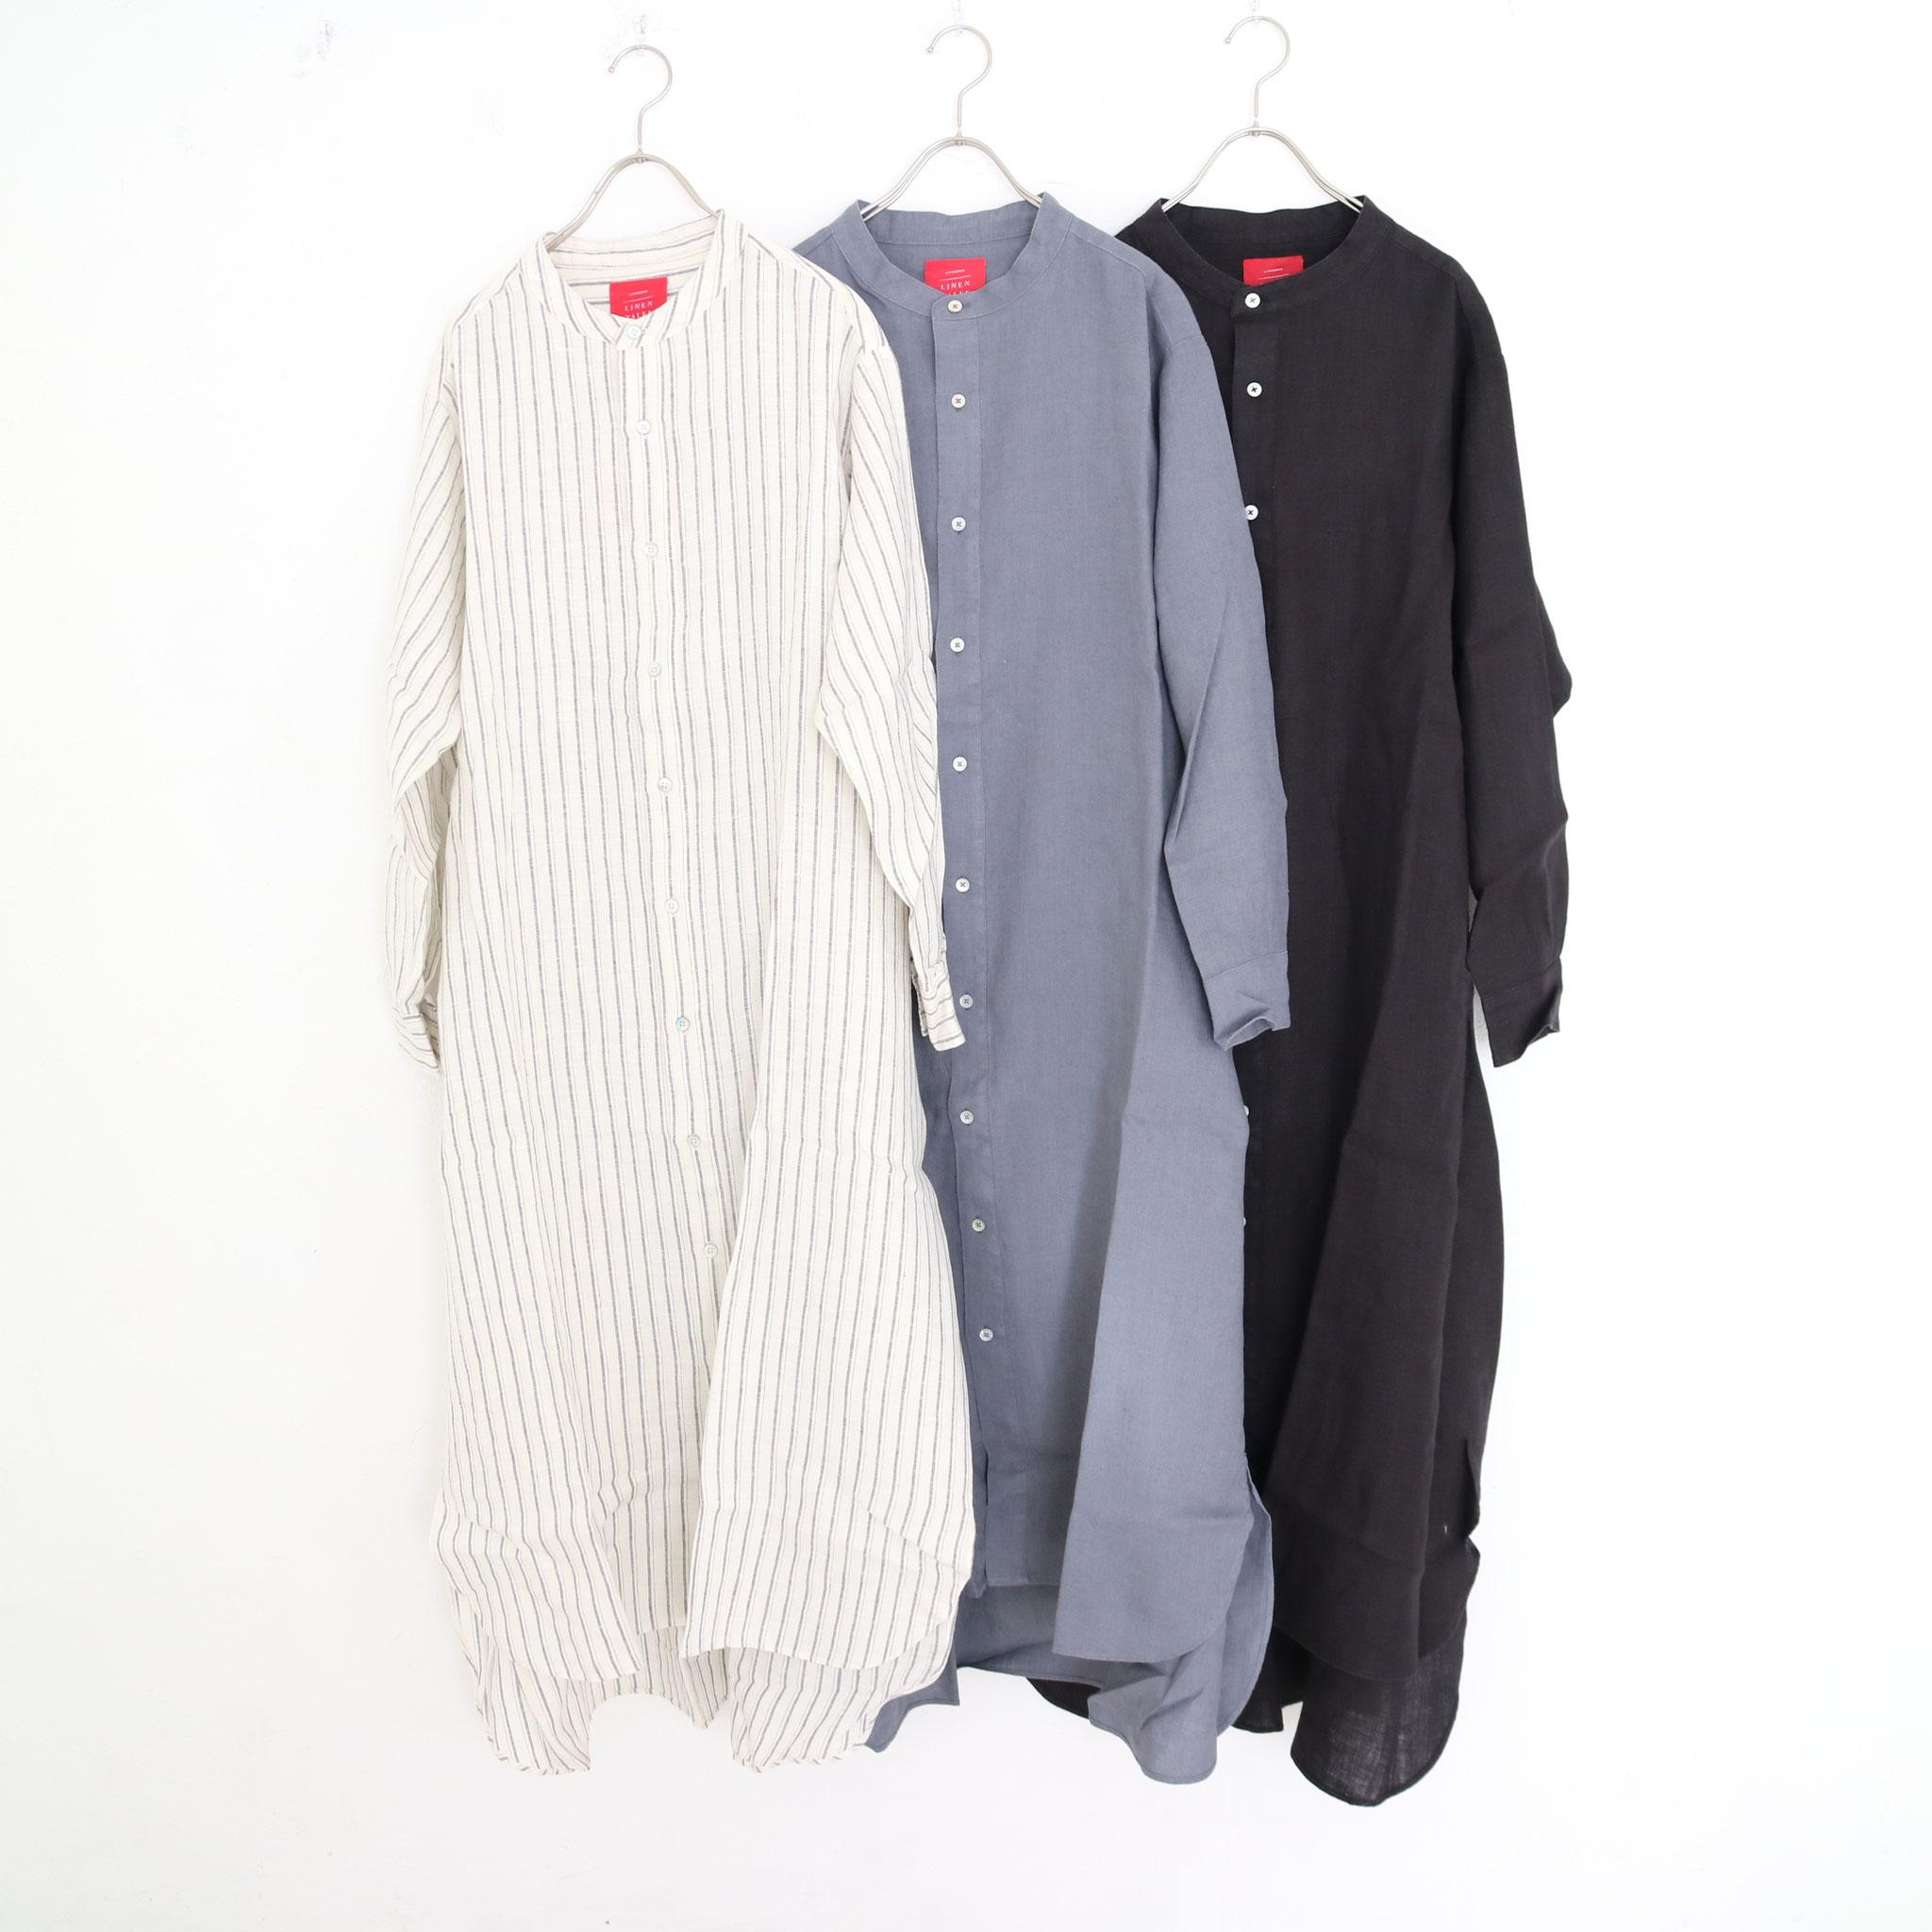 Gray stripe→ Vulcanic grass→ Black